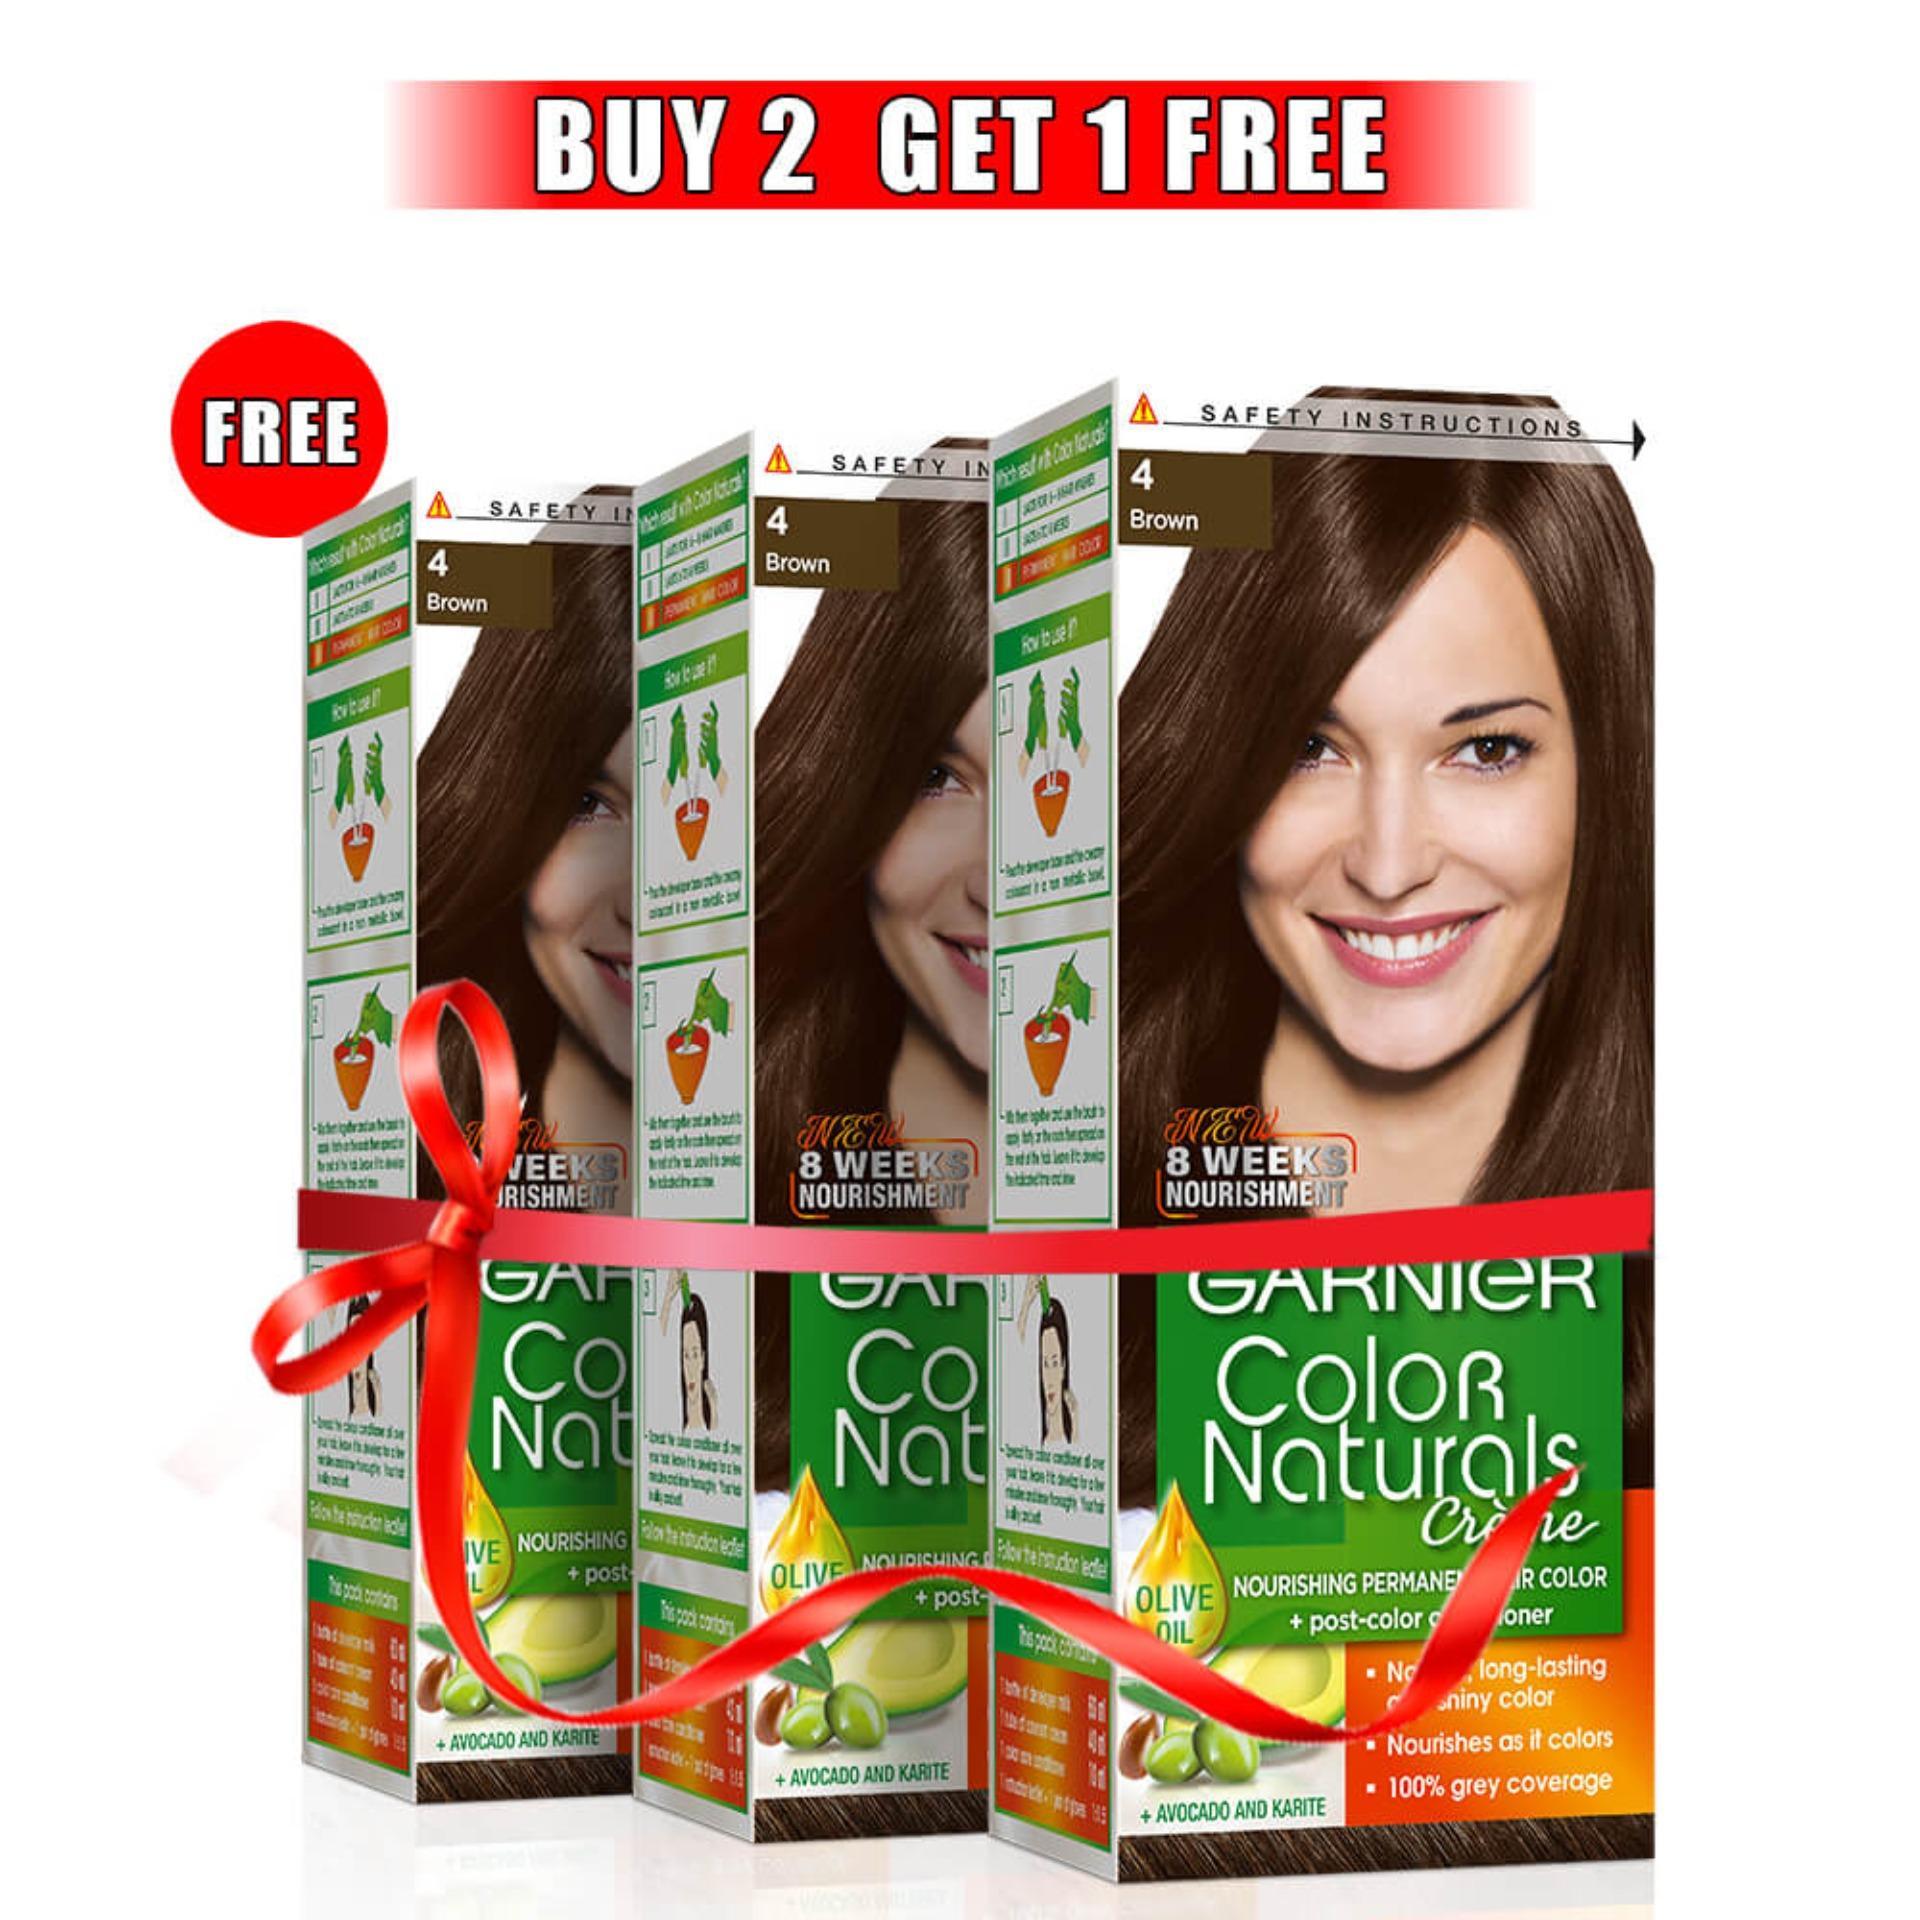 Buy Garnier Hair Coloring At Best Prices Online In Pakistan Color Naturals 2 Get 1 Free 4 Brown